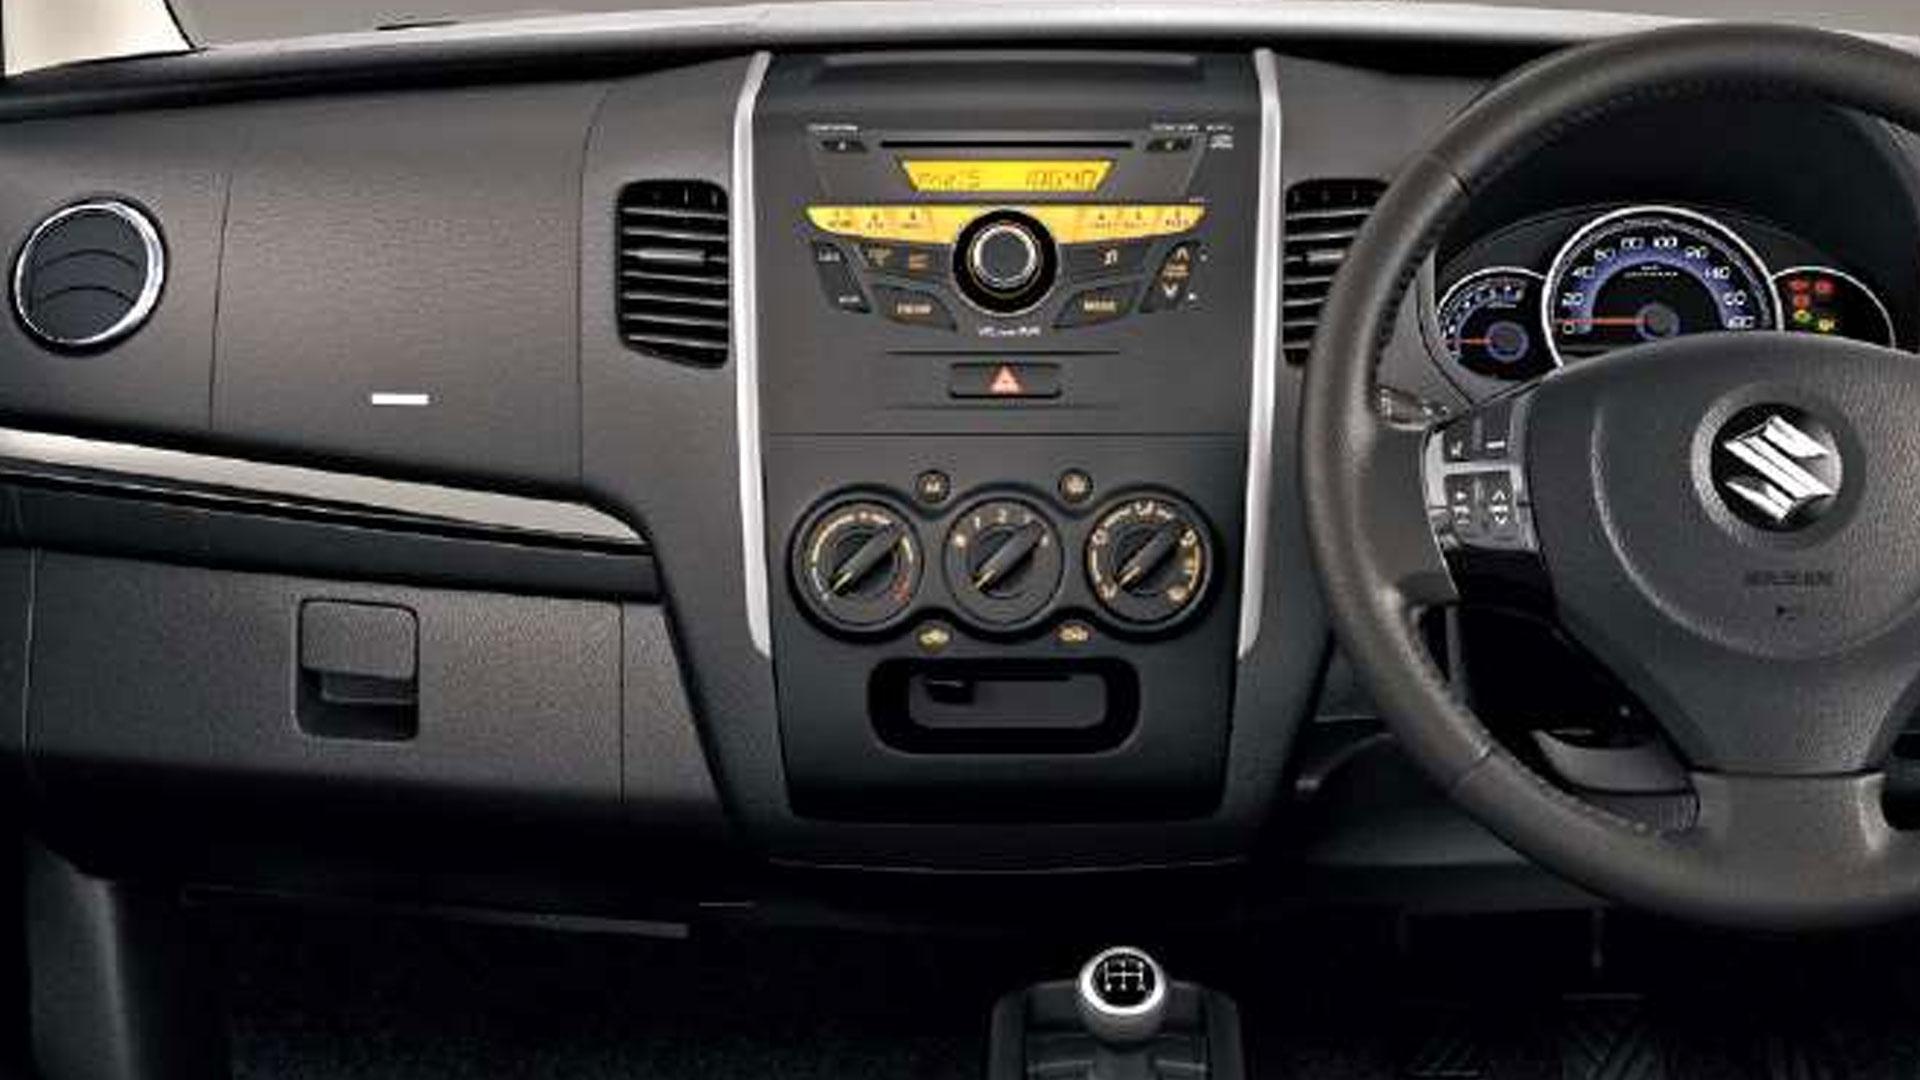 City To City Mileage >> Maruti Suzuki WagonR Stingray 2015 VXi - Price, Mileage, Reviews, Specification, Gallery - Overdrive